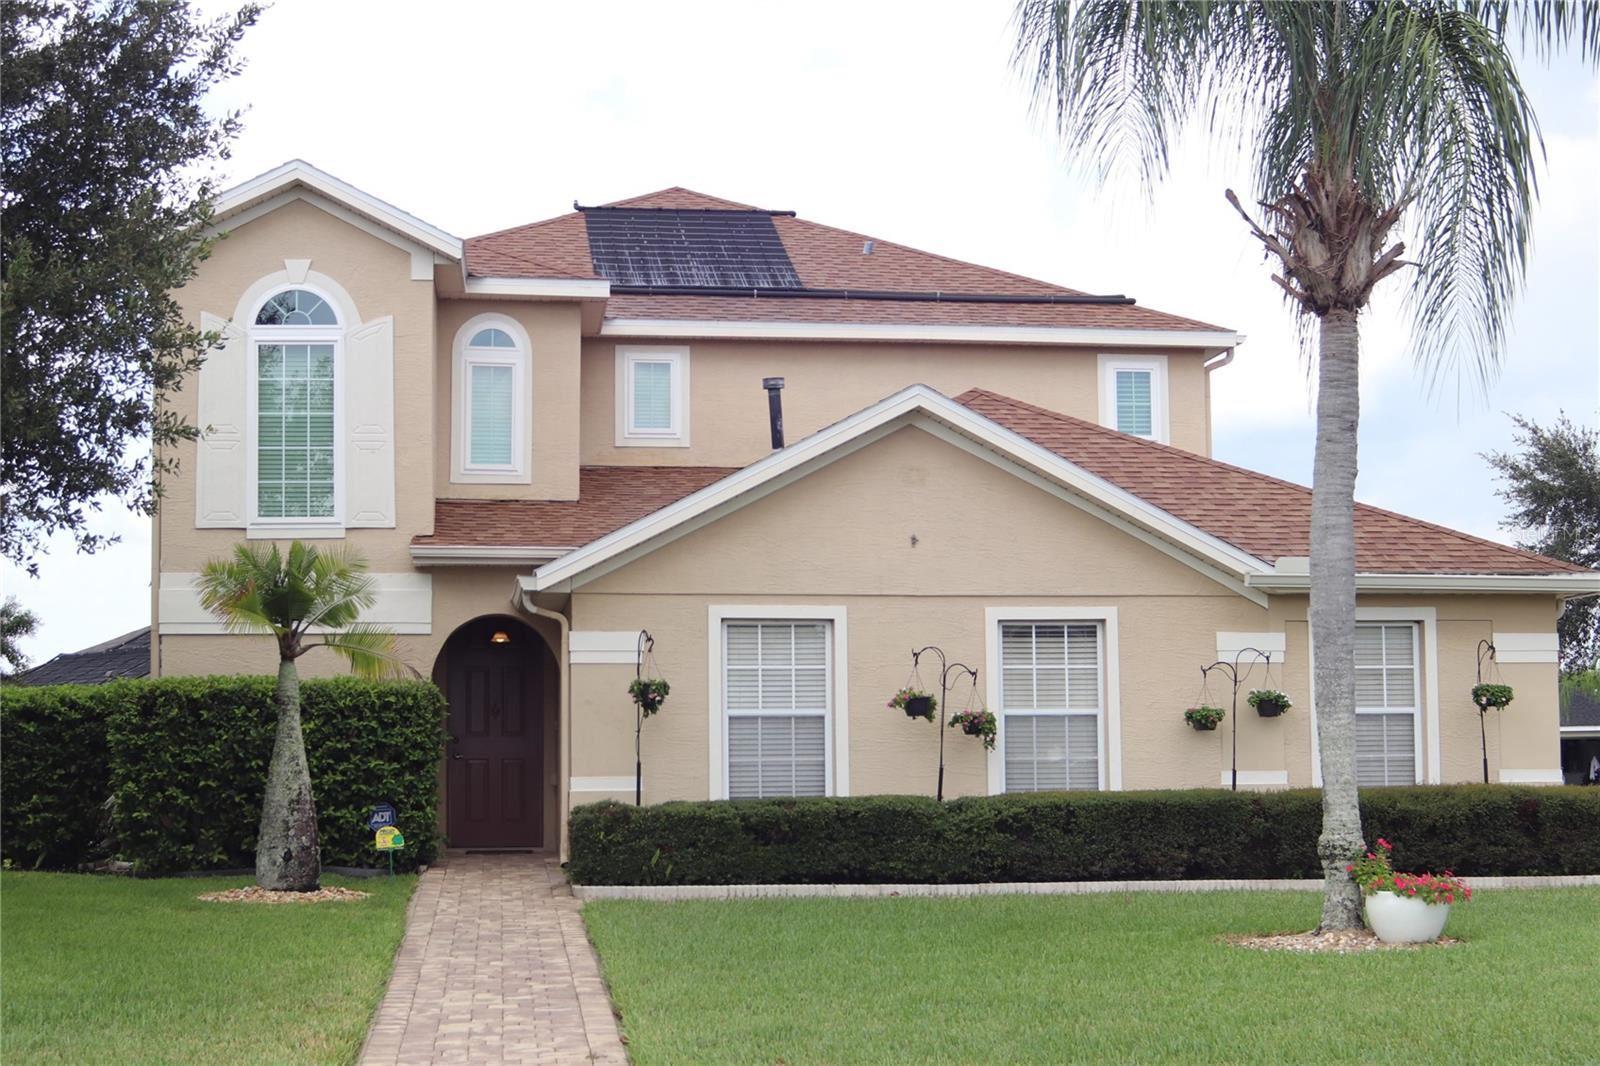 300 BOUGIVAL COURT, Orlando, FL 32828 - #: P4917278